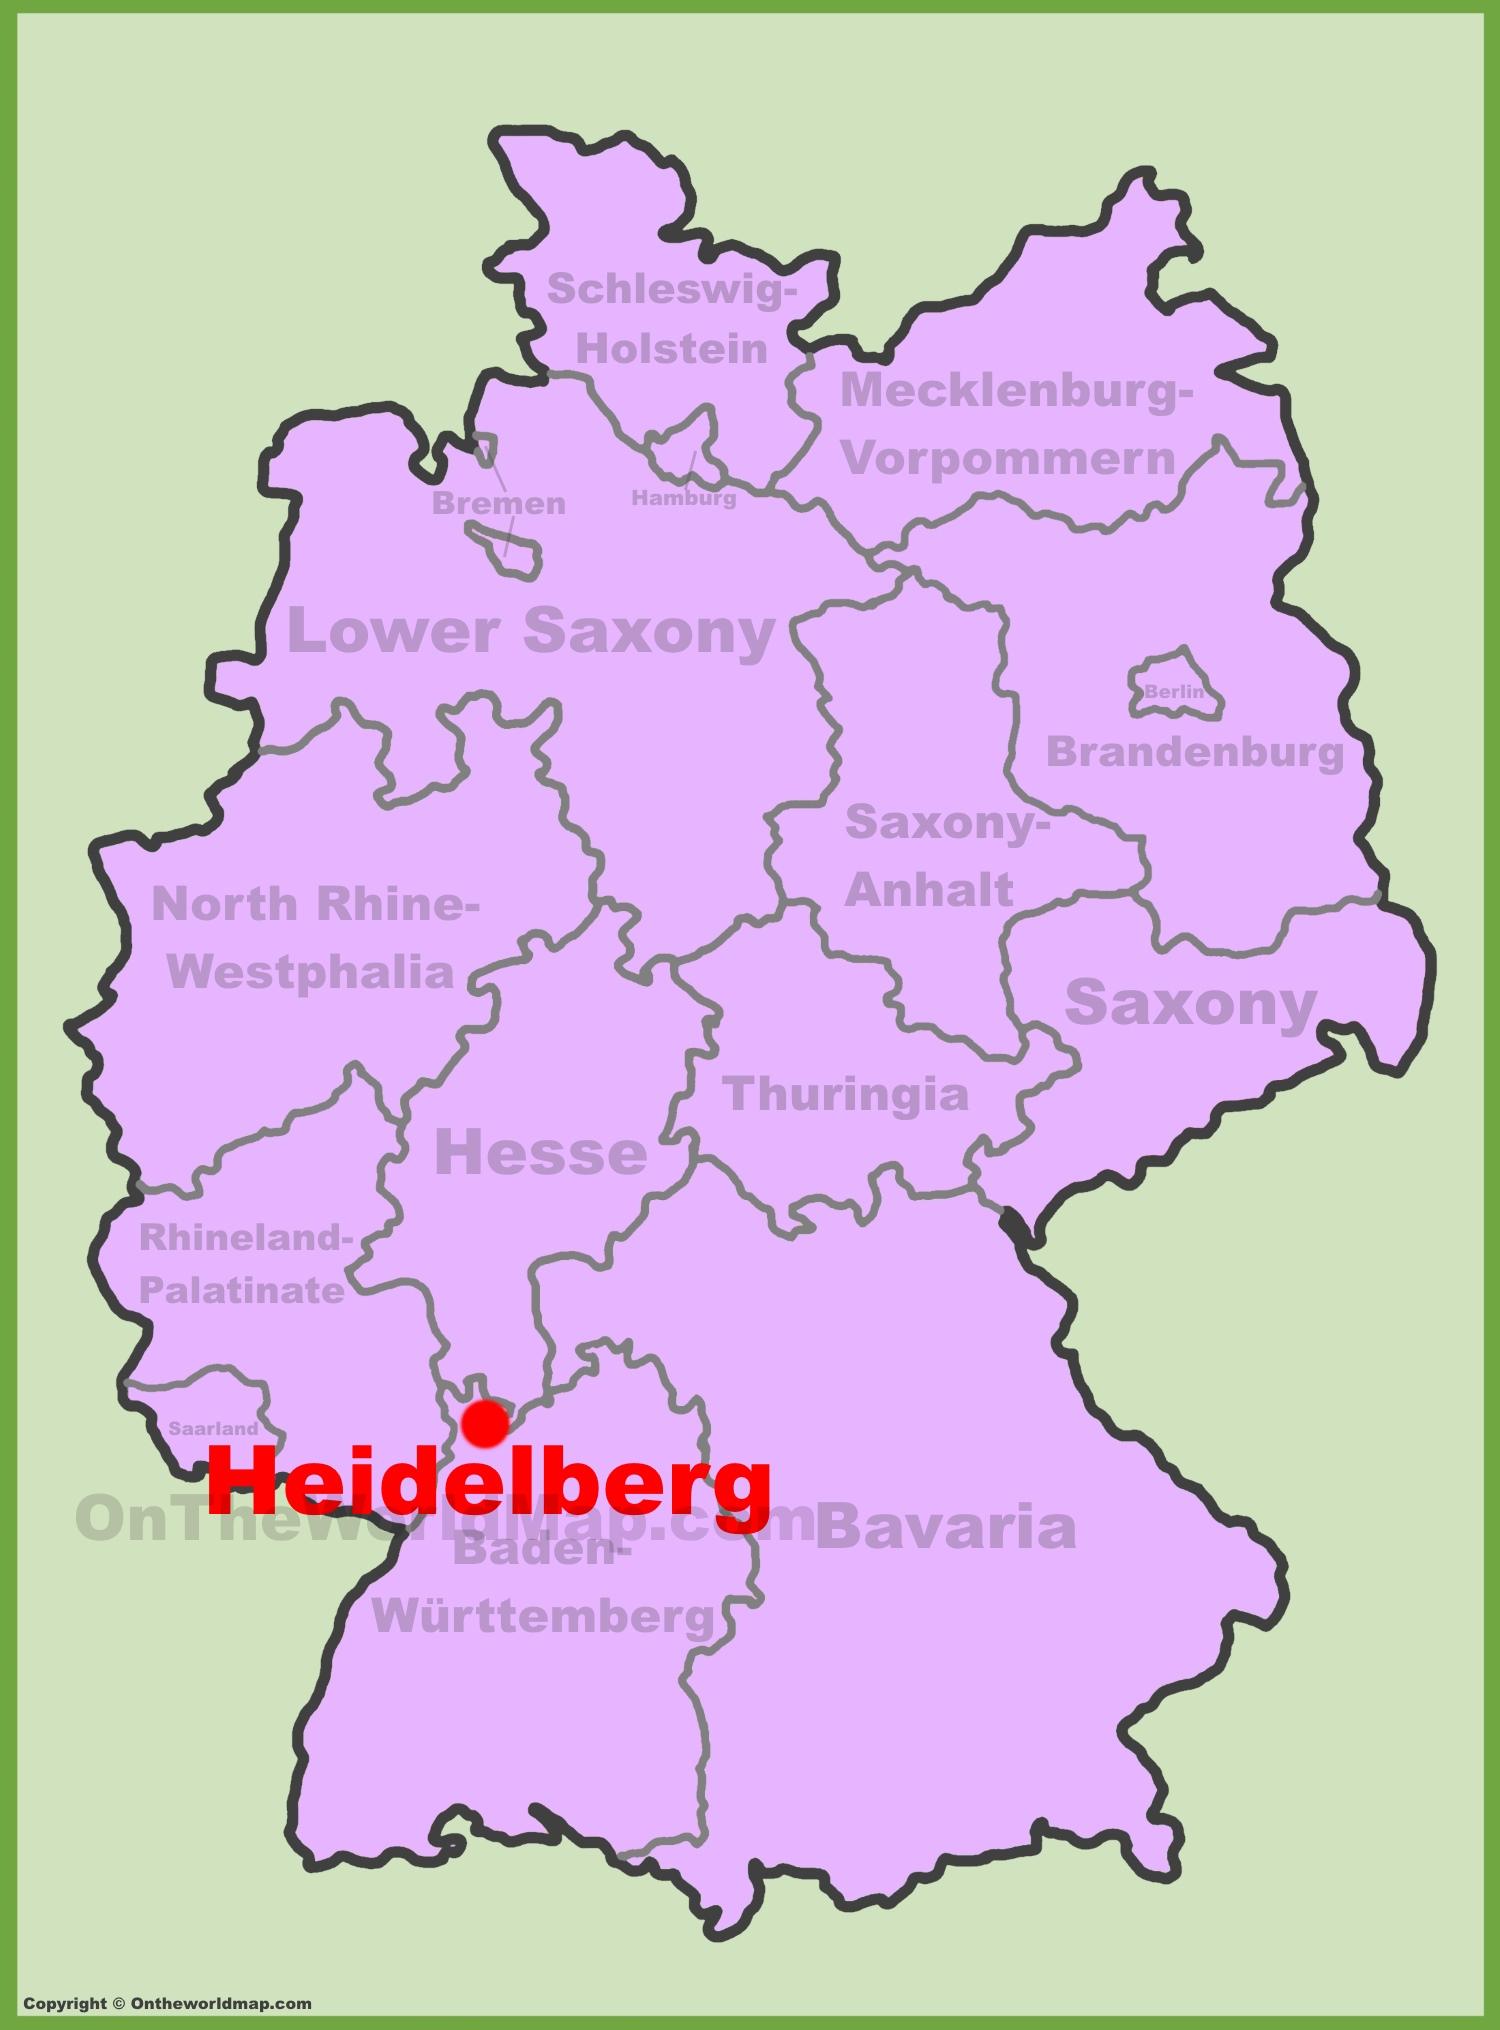 Heidelberg Germany Map Heidelberg Maps | Germany | Maps of Heidelberg Heidelberg Germany Map